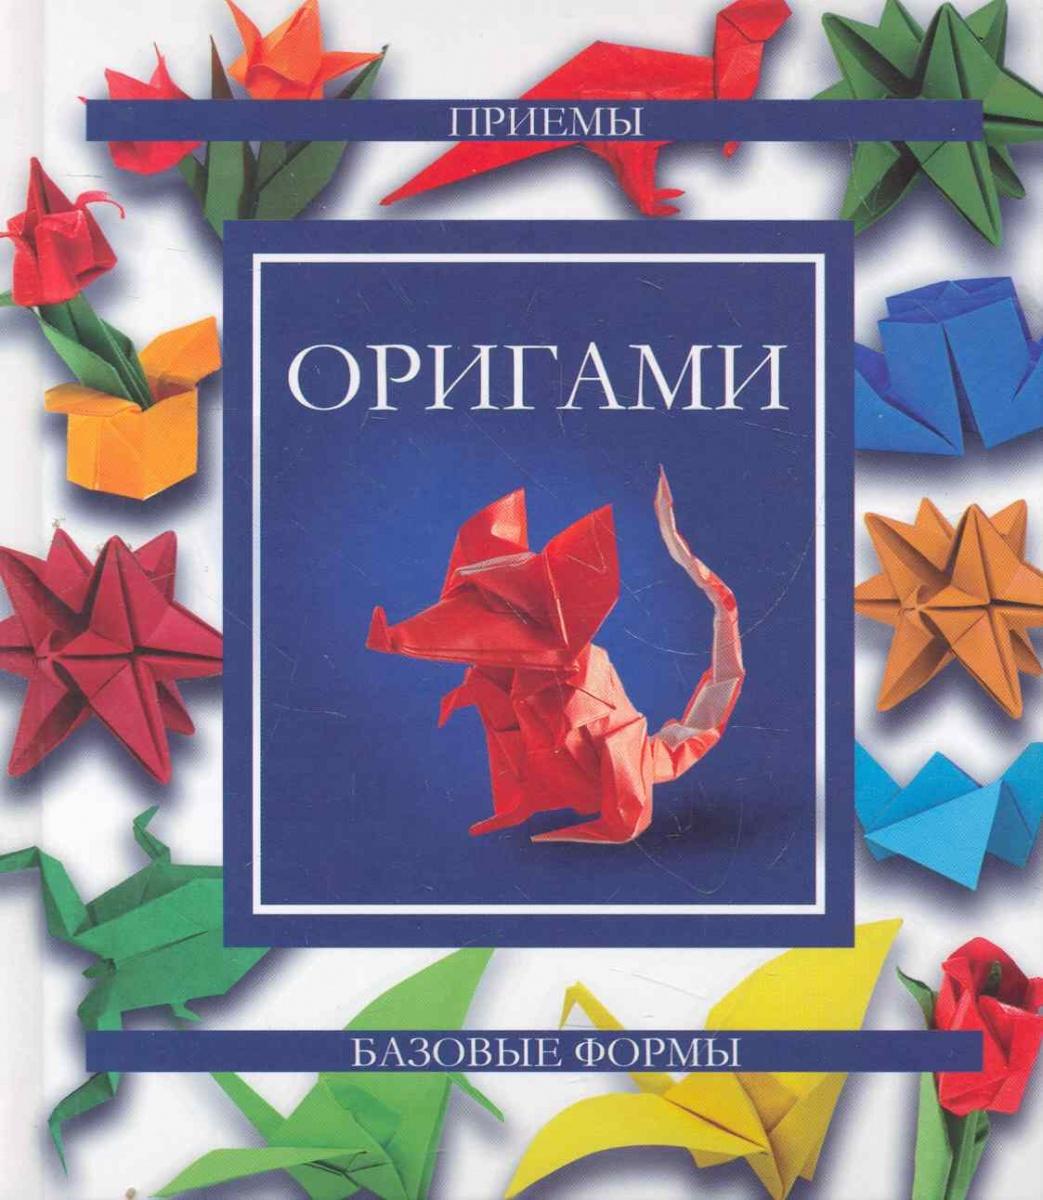 Нестерова Д. Оригами baby rattles